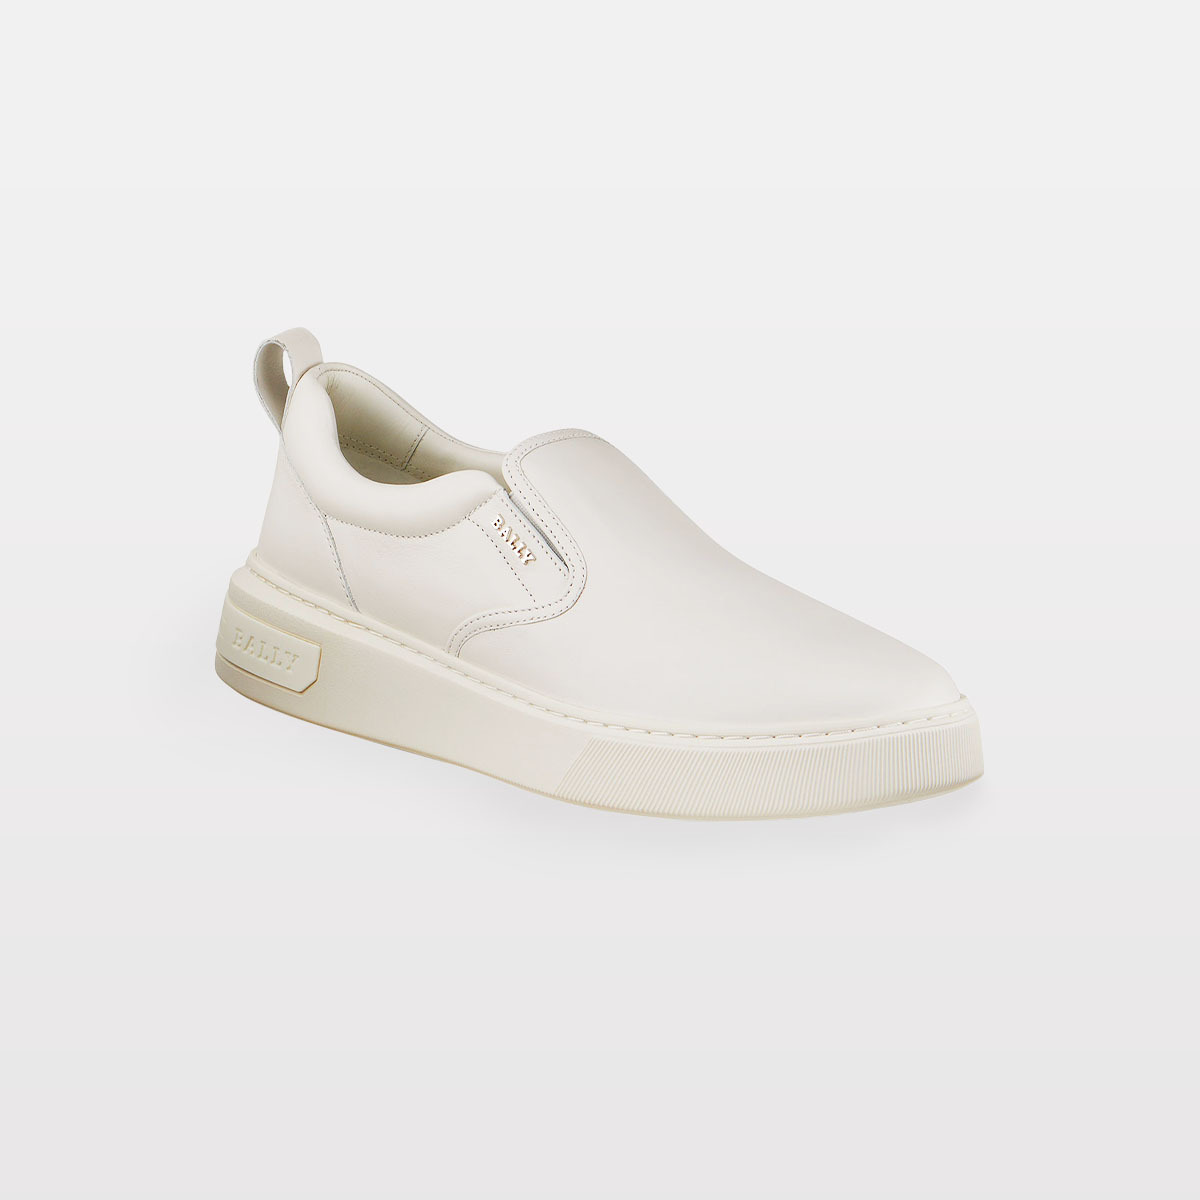 Bally Mardy 07 Tonal Calfskin Slip-On Sneakers NEIMAN MARCUS